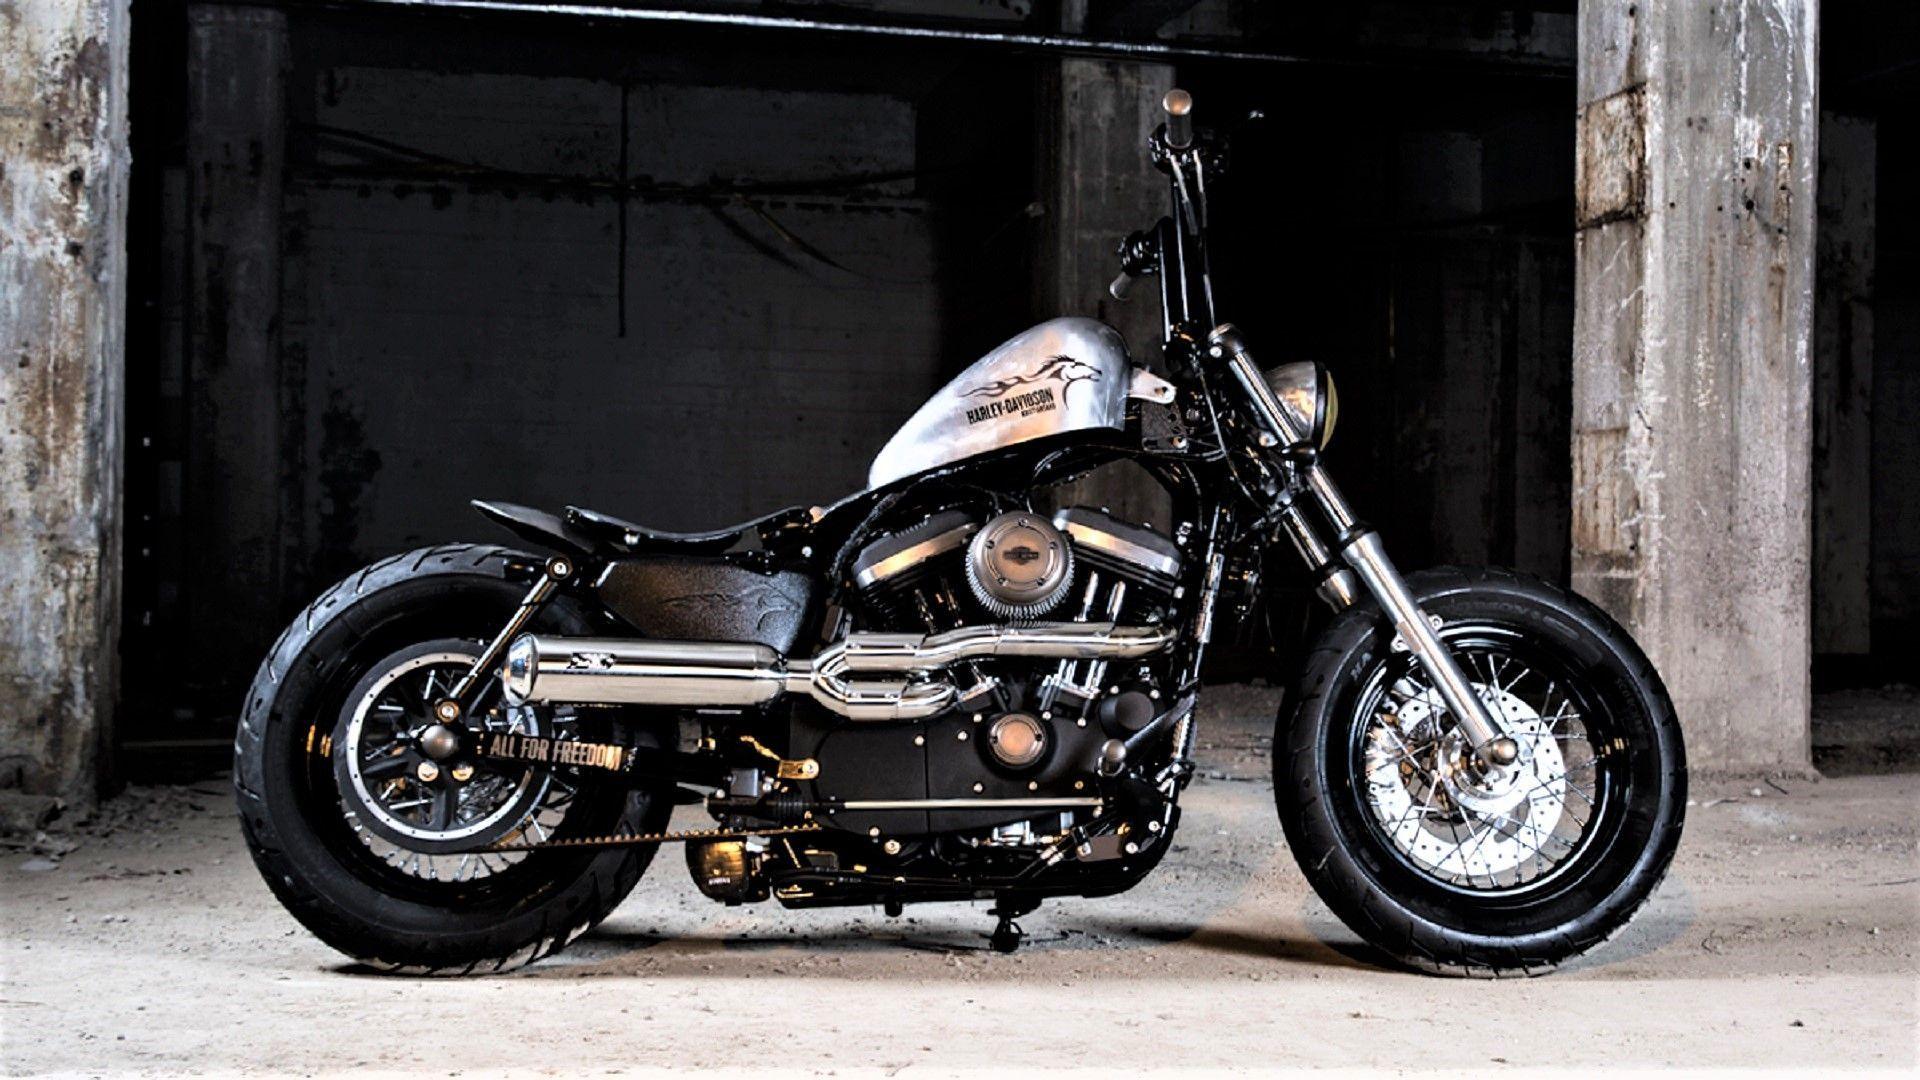 Pin di hd bike pics su hardcore harley davidson motorcycle pics